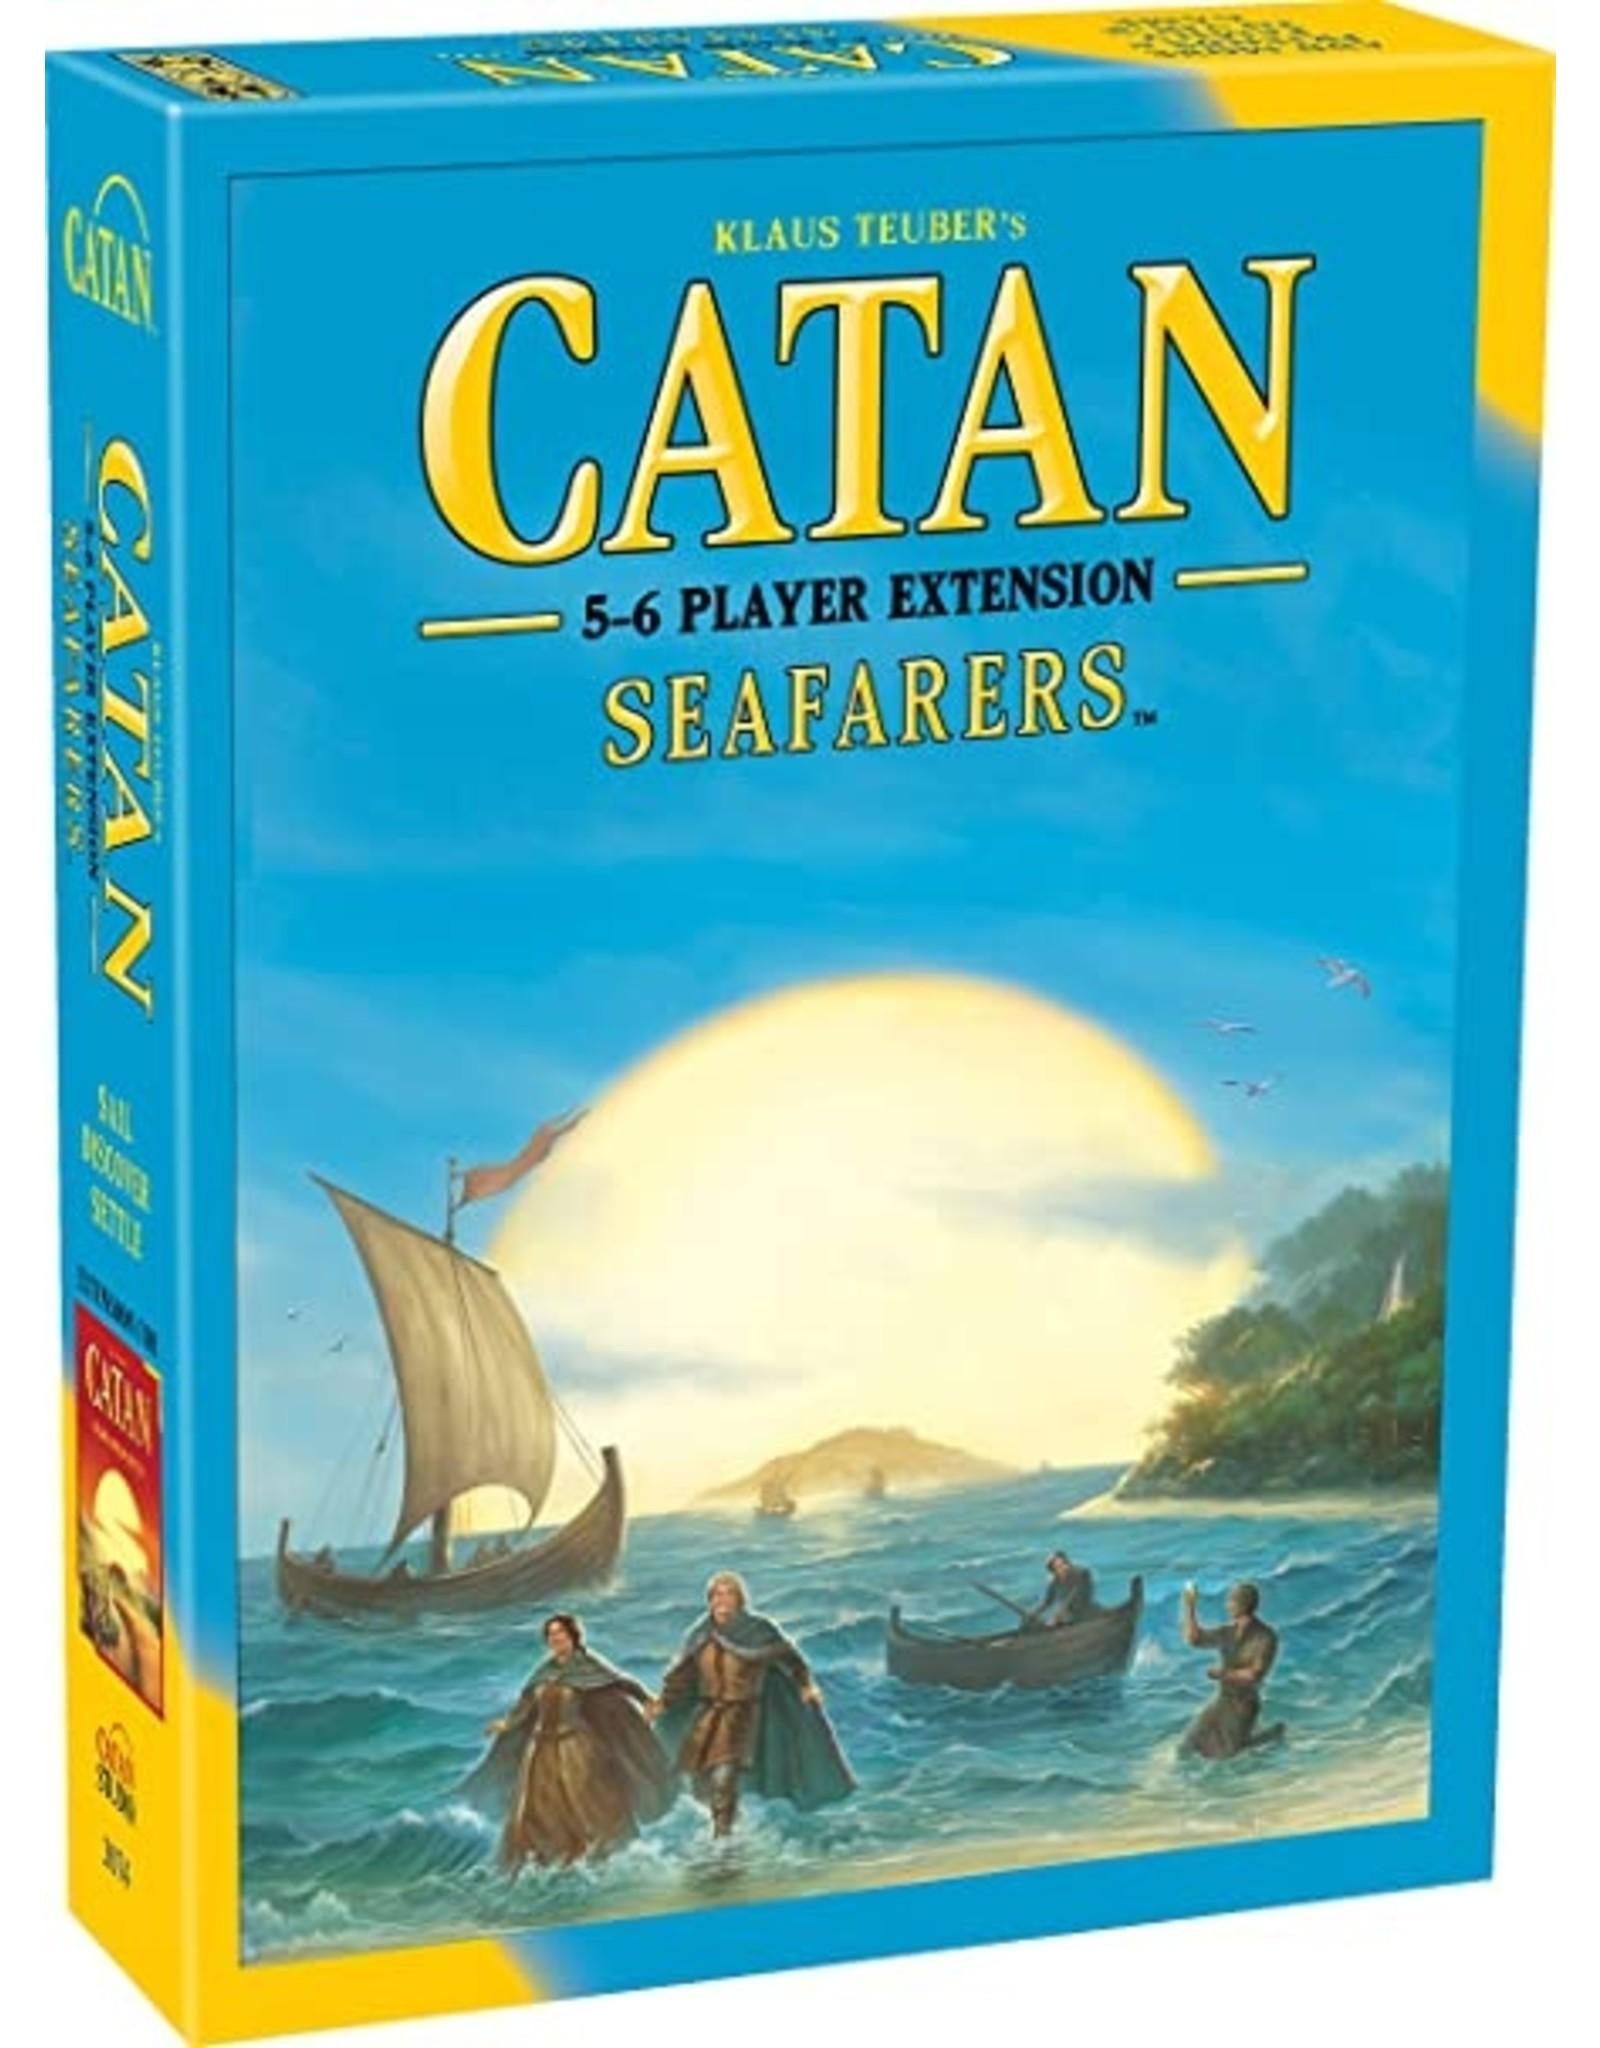 Mayfair Games Catan Seafarers 5-6 player expansion